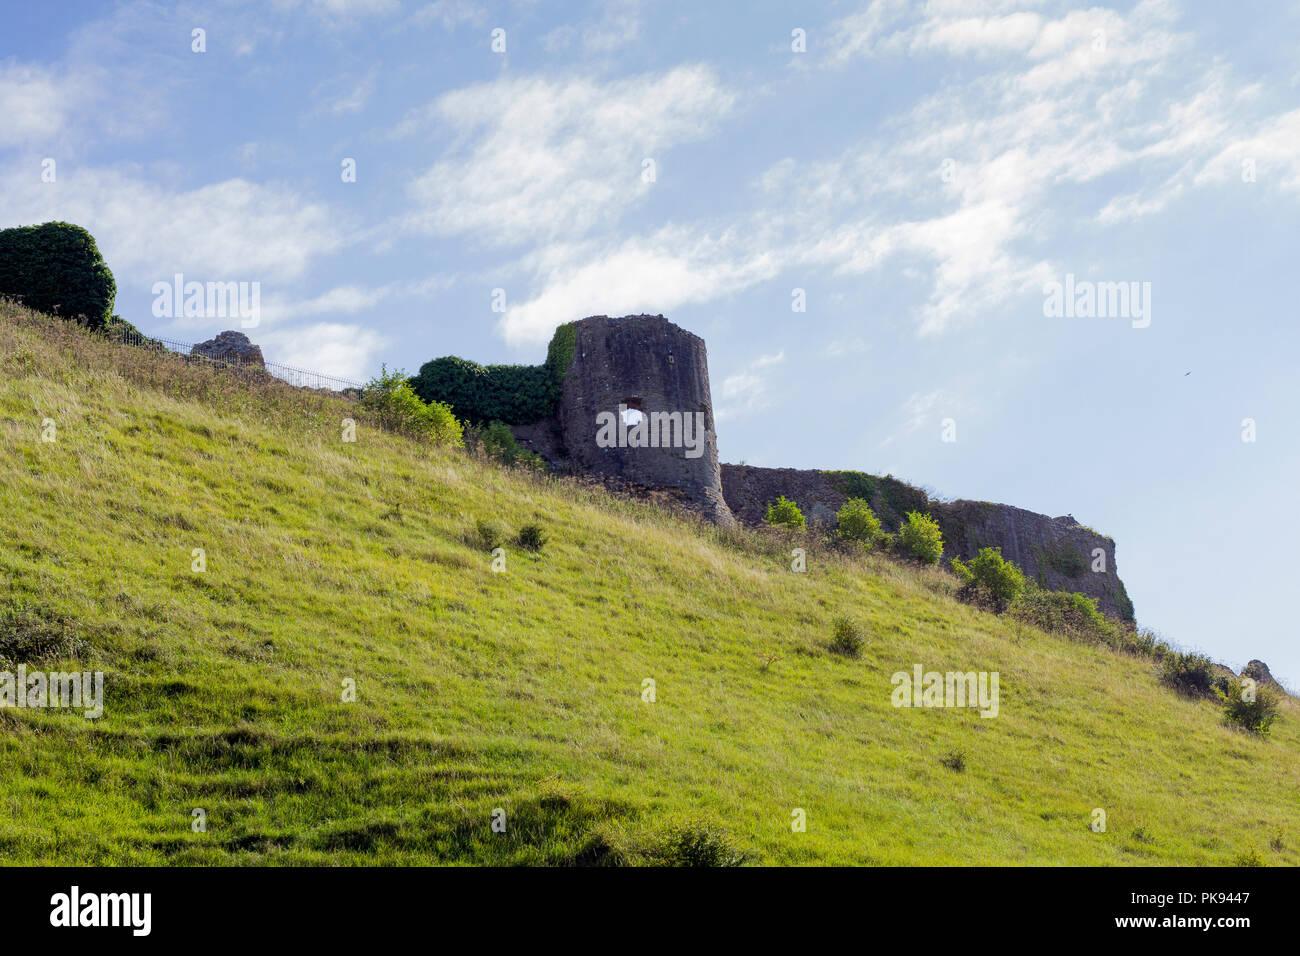 Corfe Castle, hilltop ruins seen from the public road below, September 2018, Dorset, UK - Stock Image